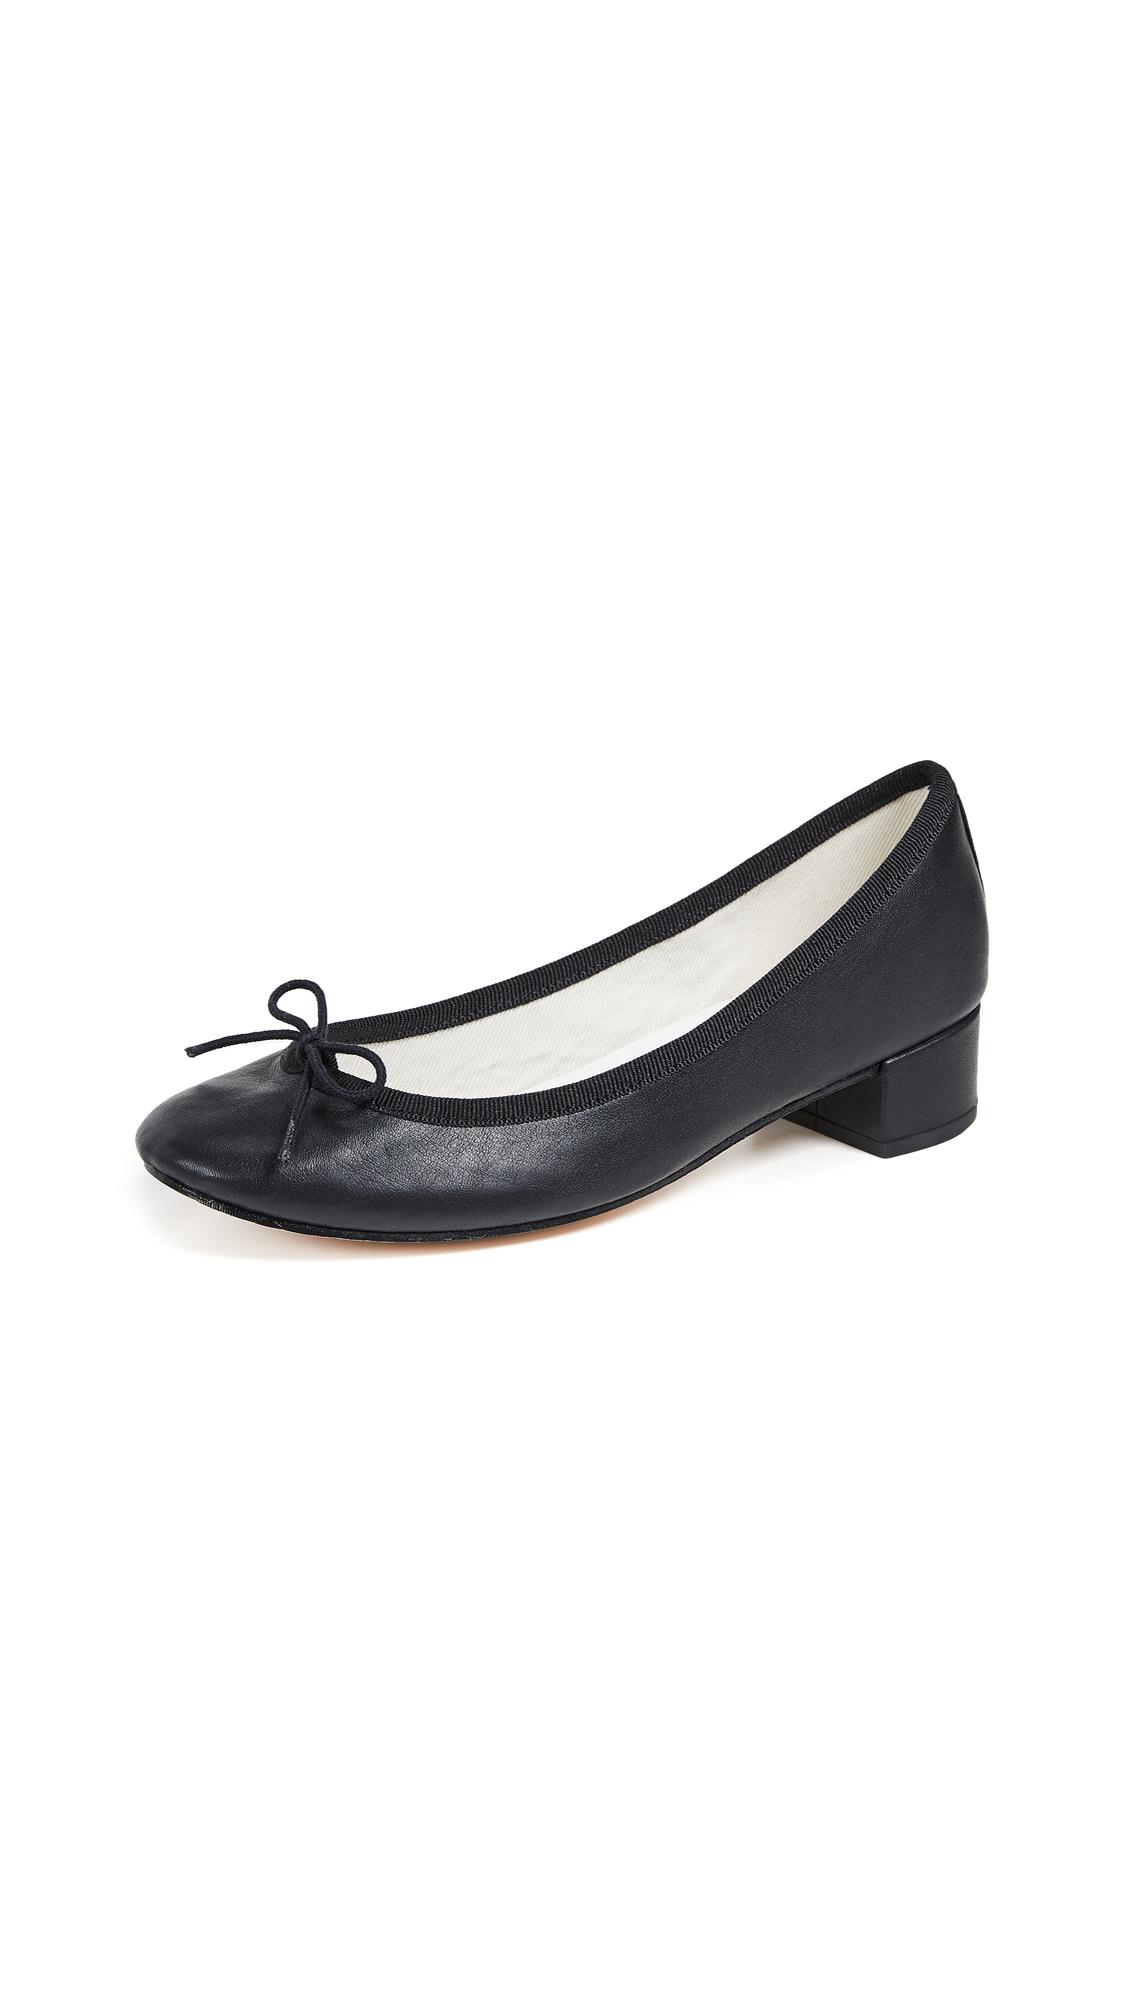 Repetto Camille Ballerina Heels - Noir